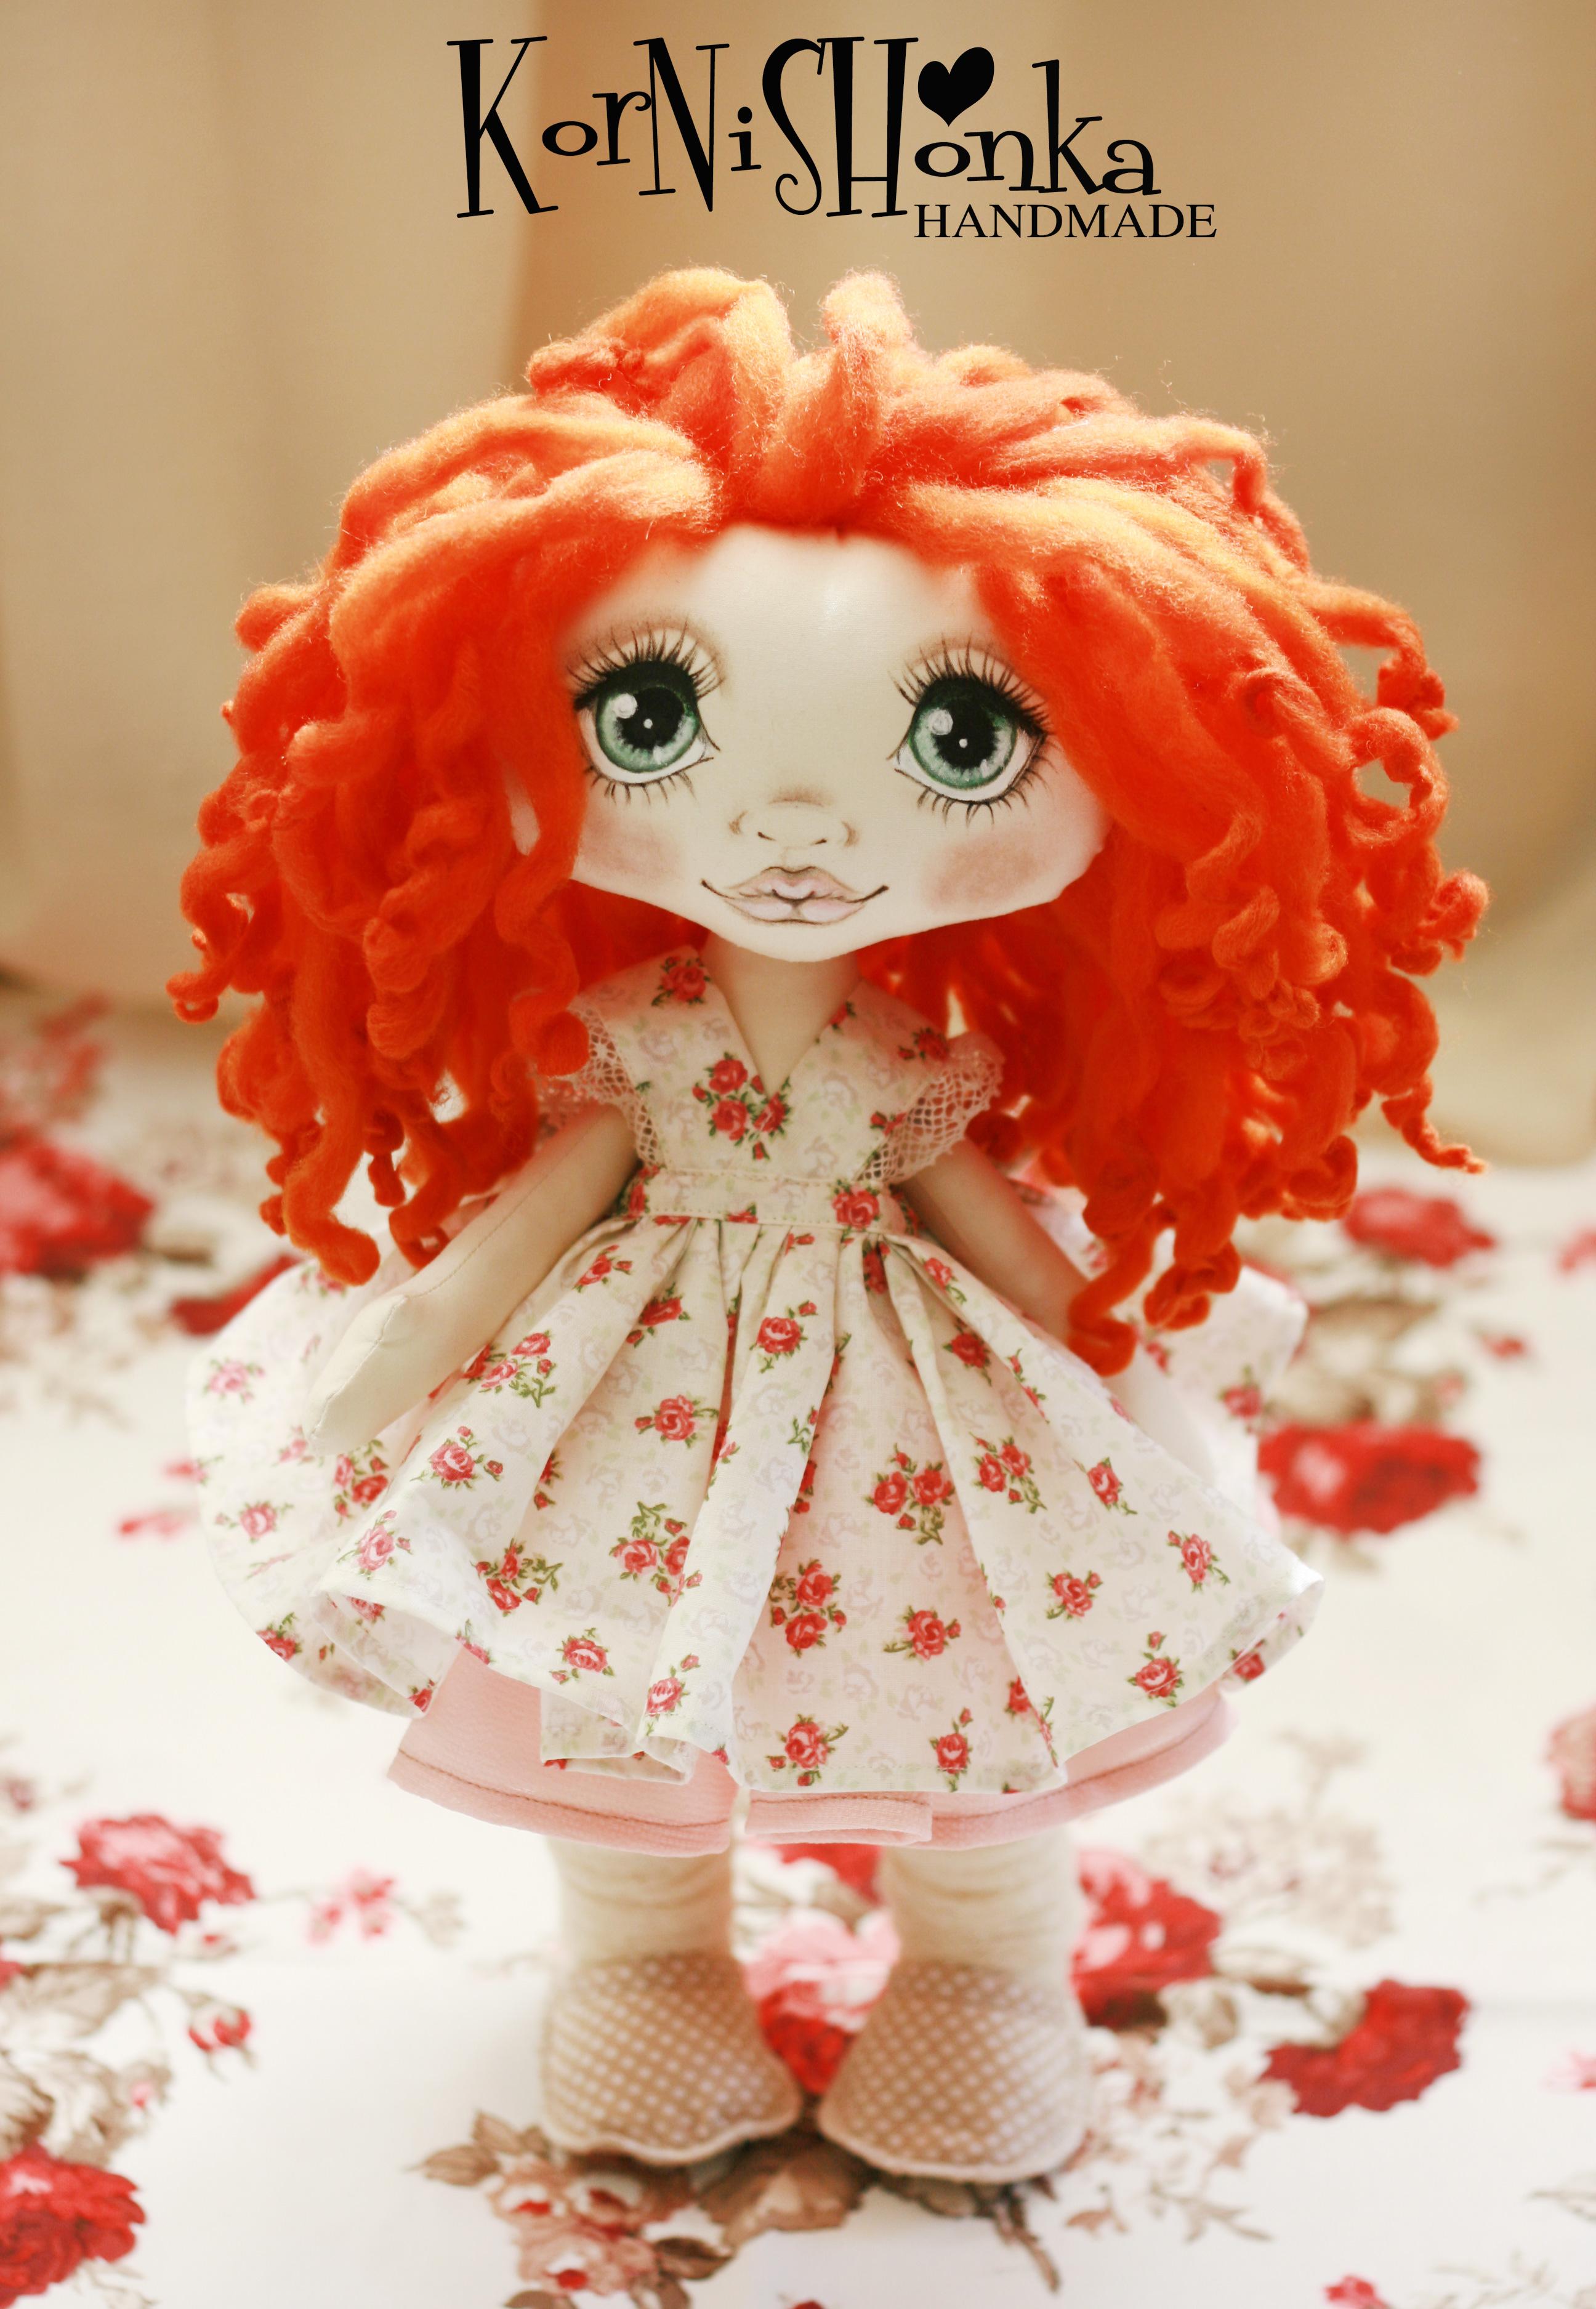 Handmade Dolls By Korneliya Haralanova Crafts And